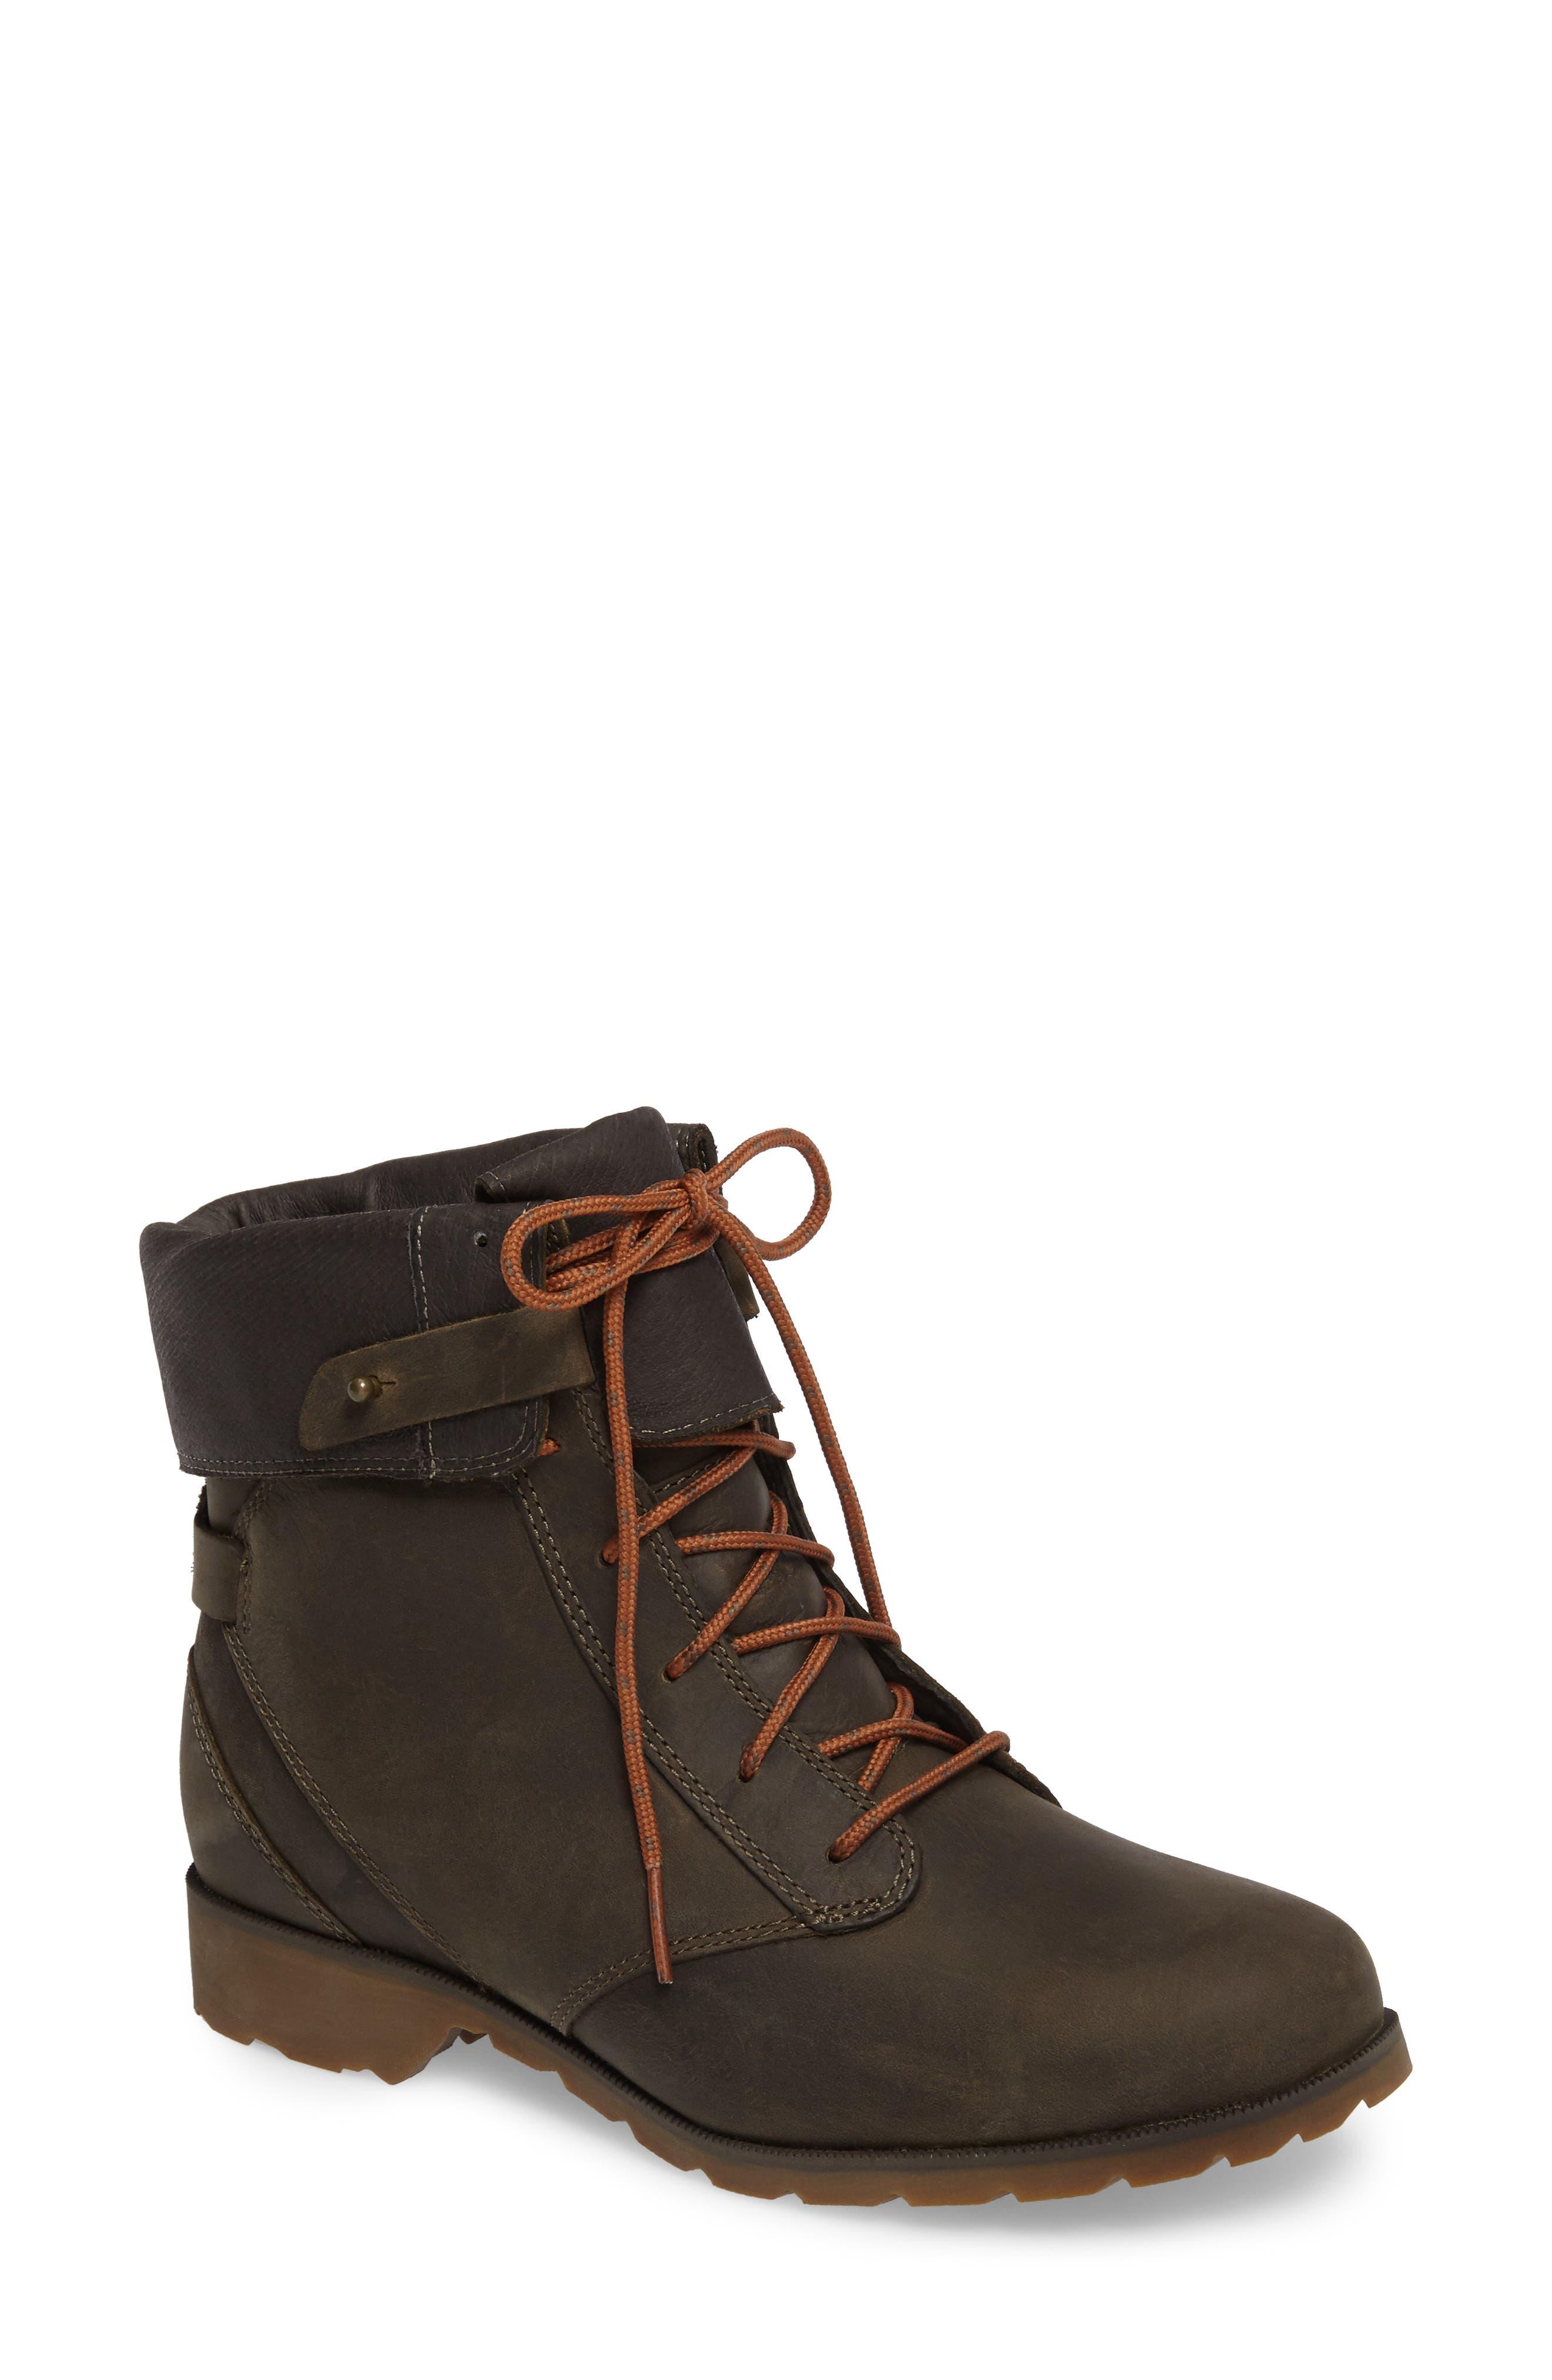 'De La Vina' Waterproof Lace-Up Boot,                         Main,                         color, Dark Olive Leather